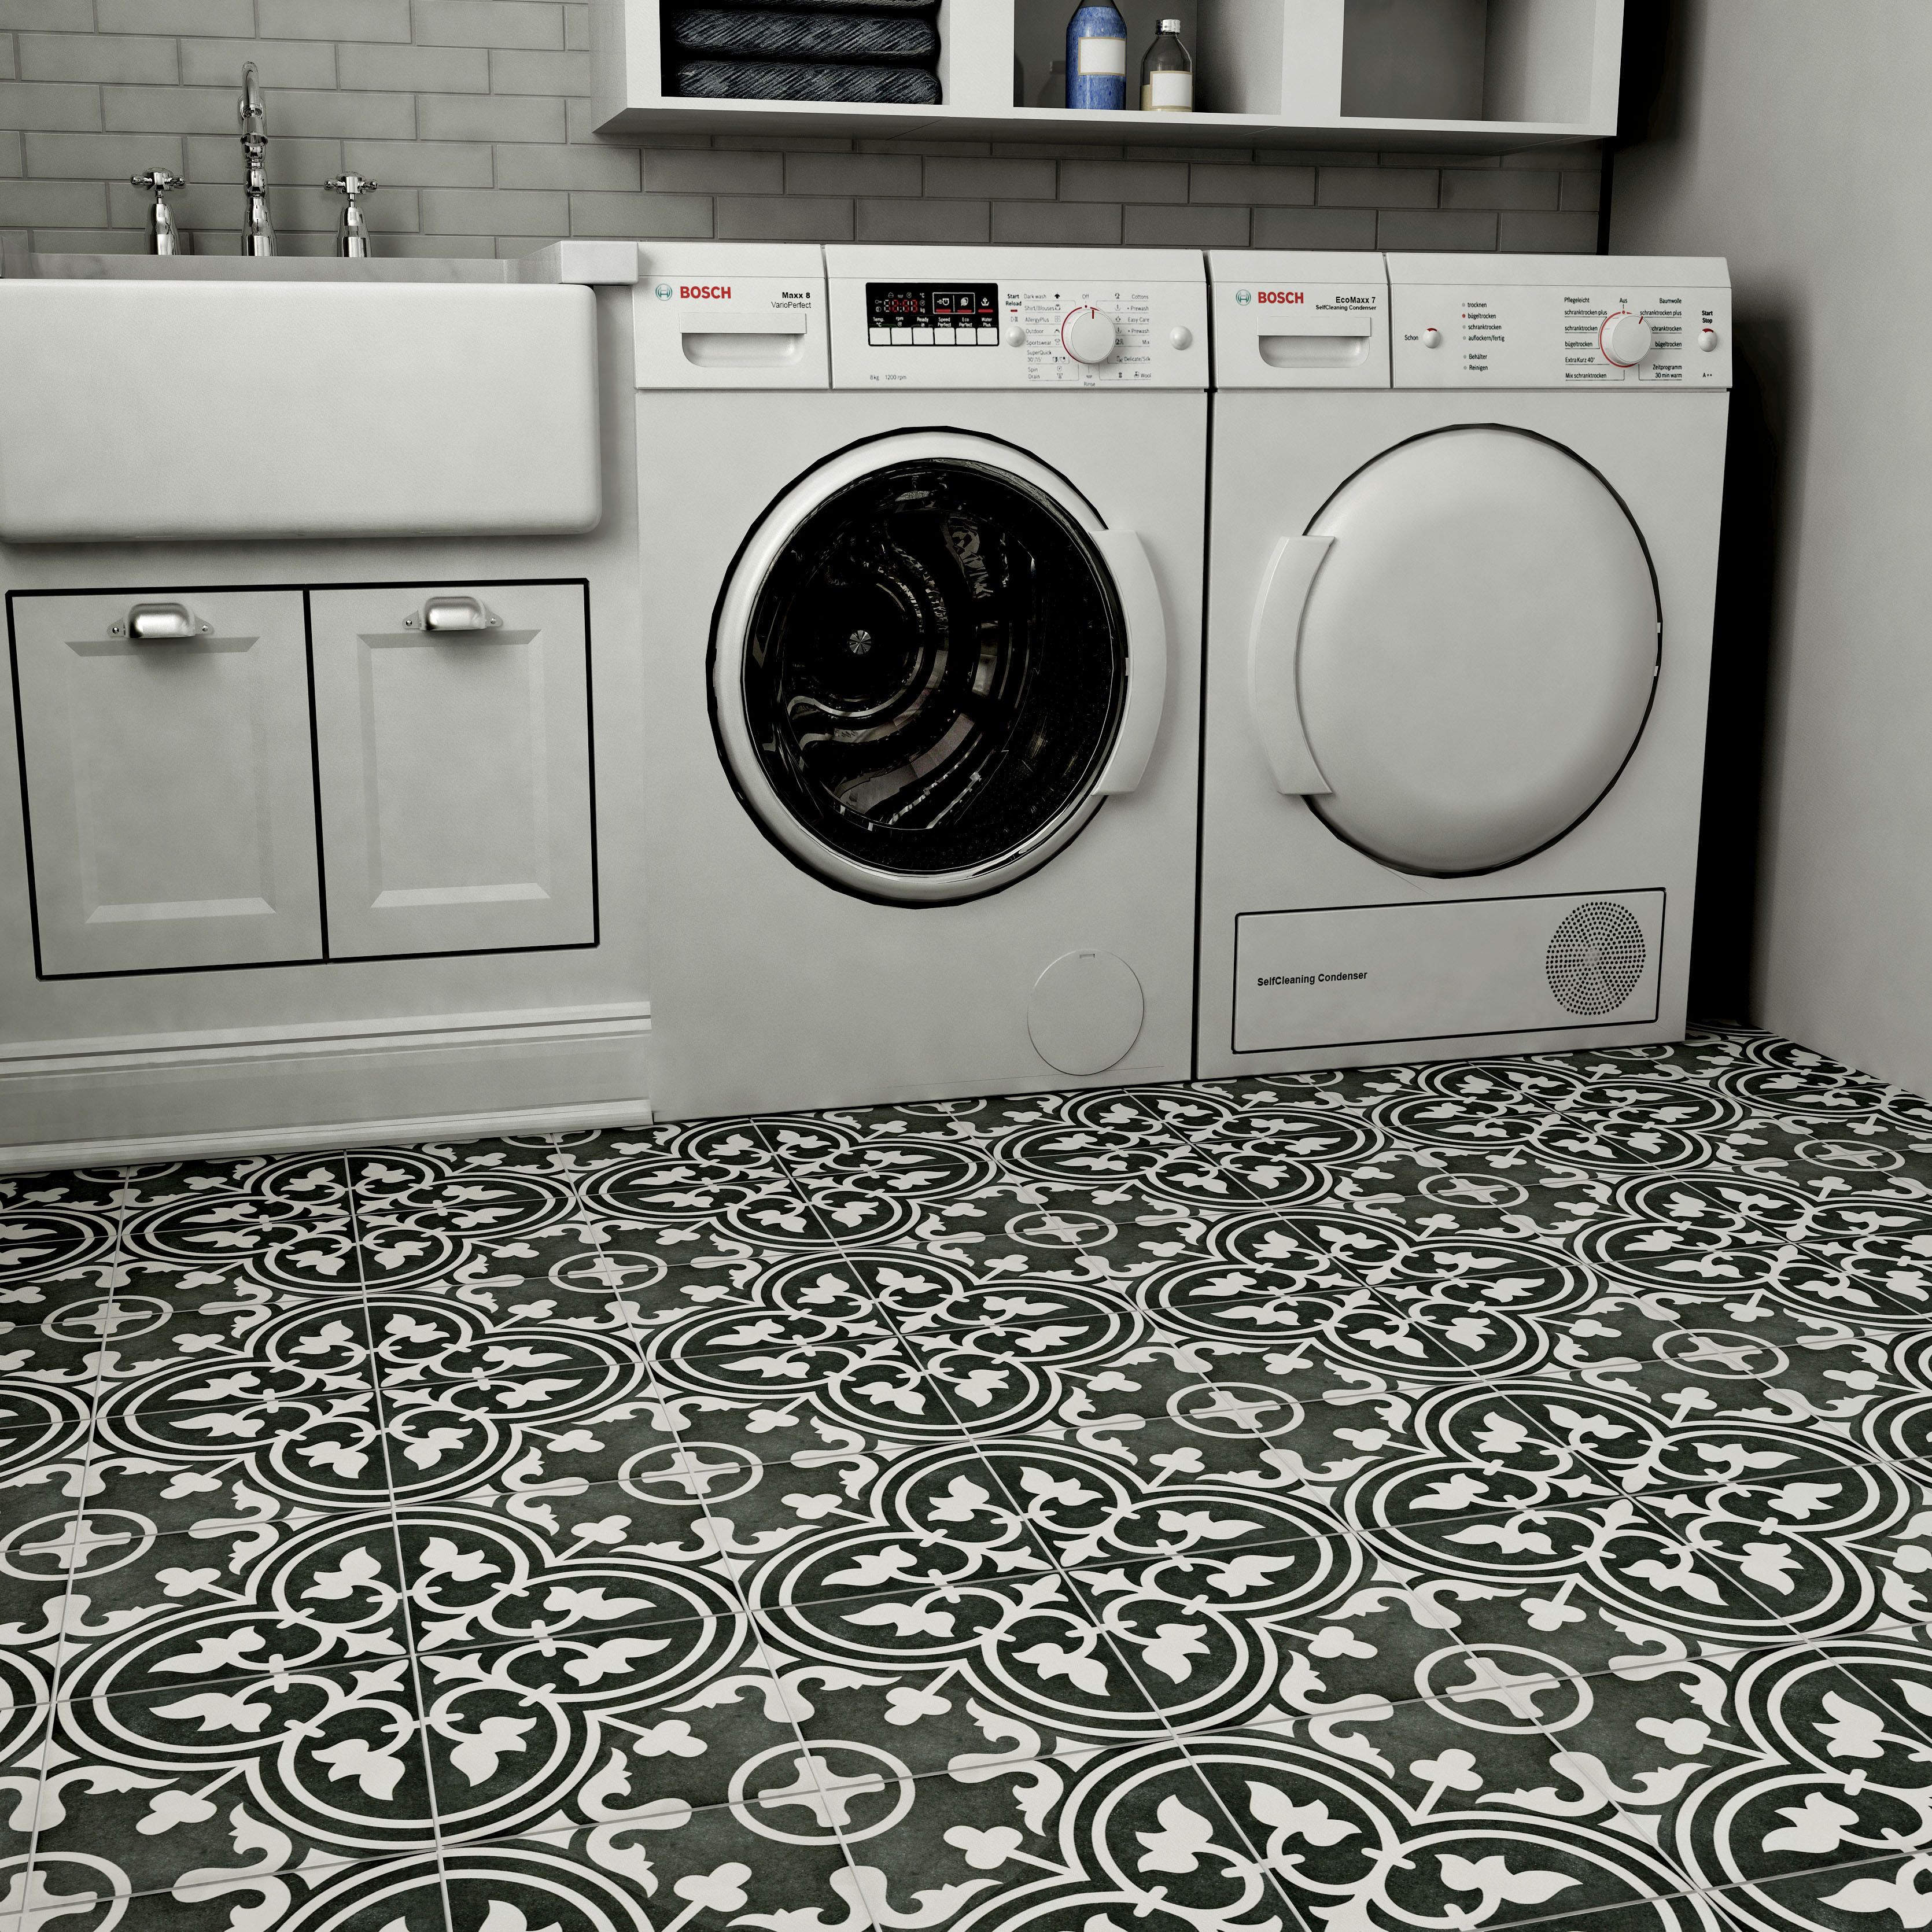 Elitetile Arte 975 X 975 Porcelain Field Tile In Black